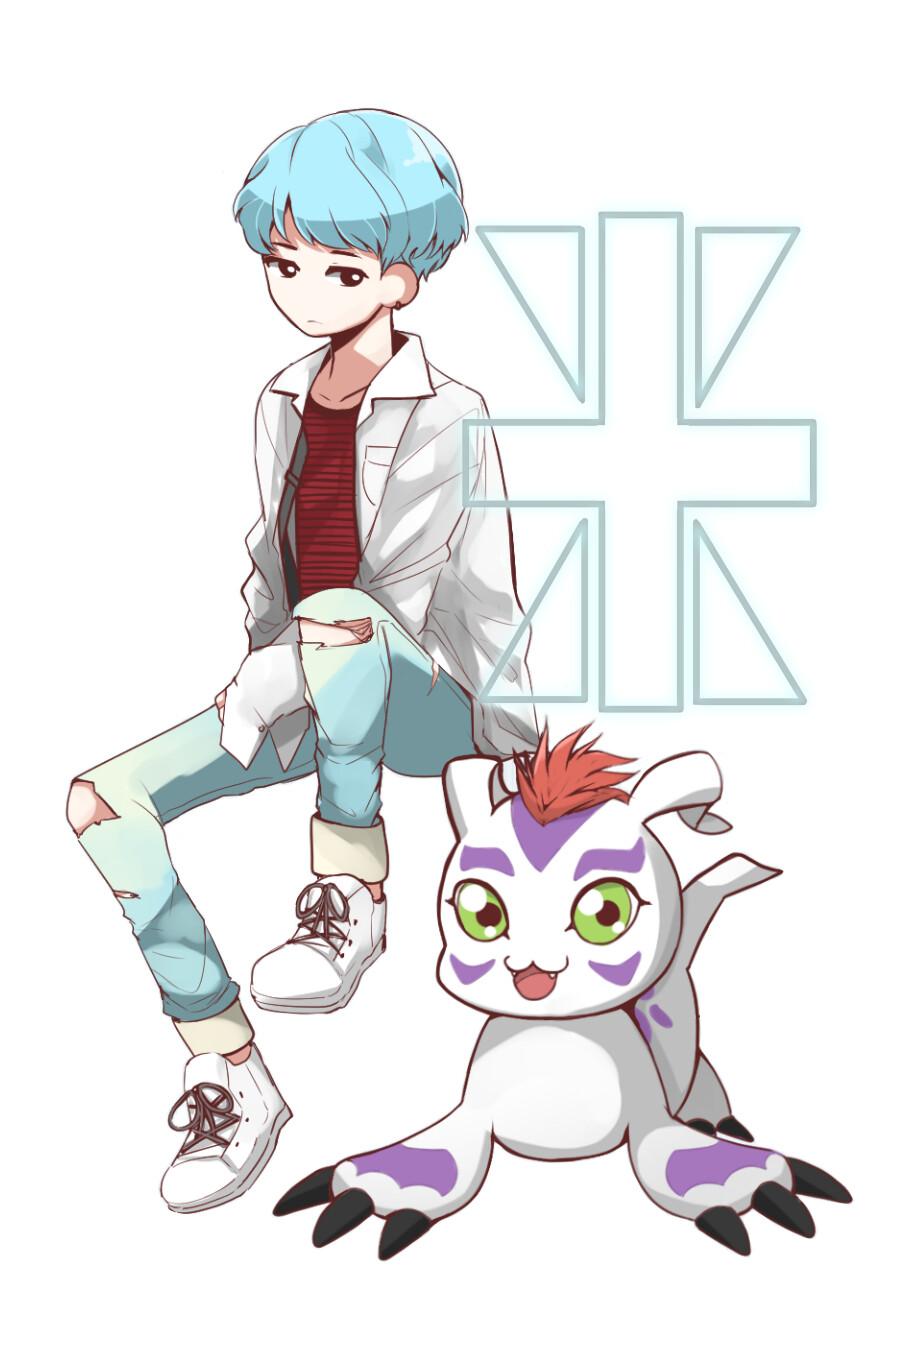 Yoongi - Crest of Reliability [BTS x Digimon Sticker]